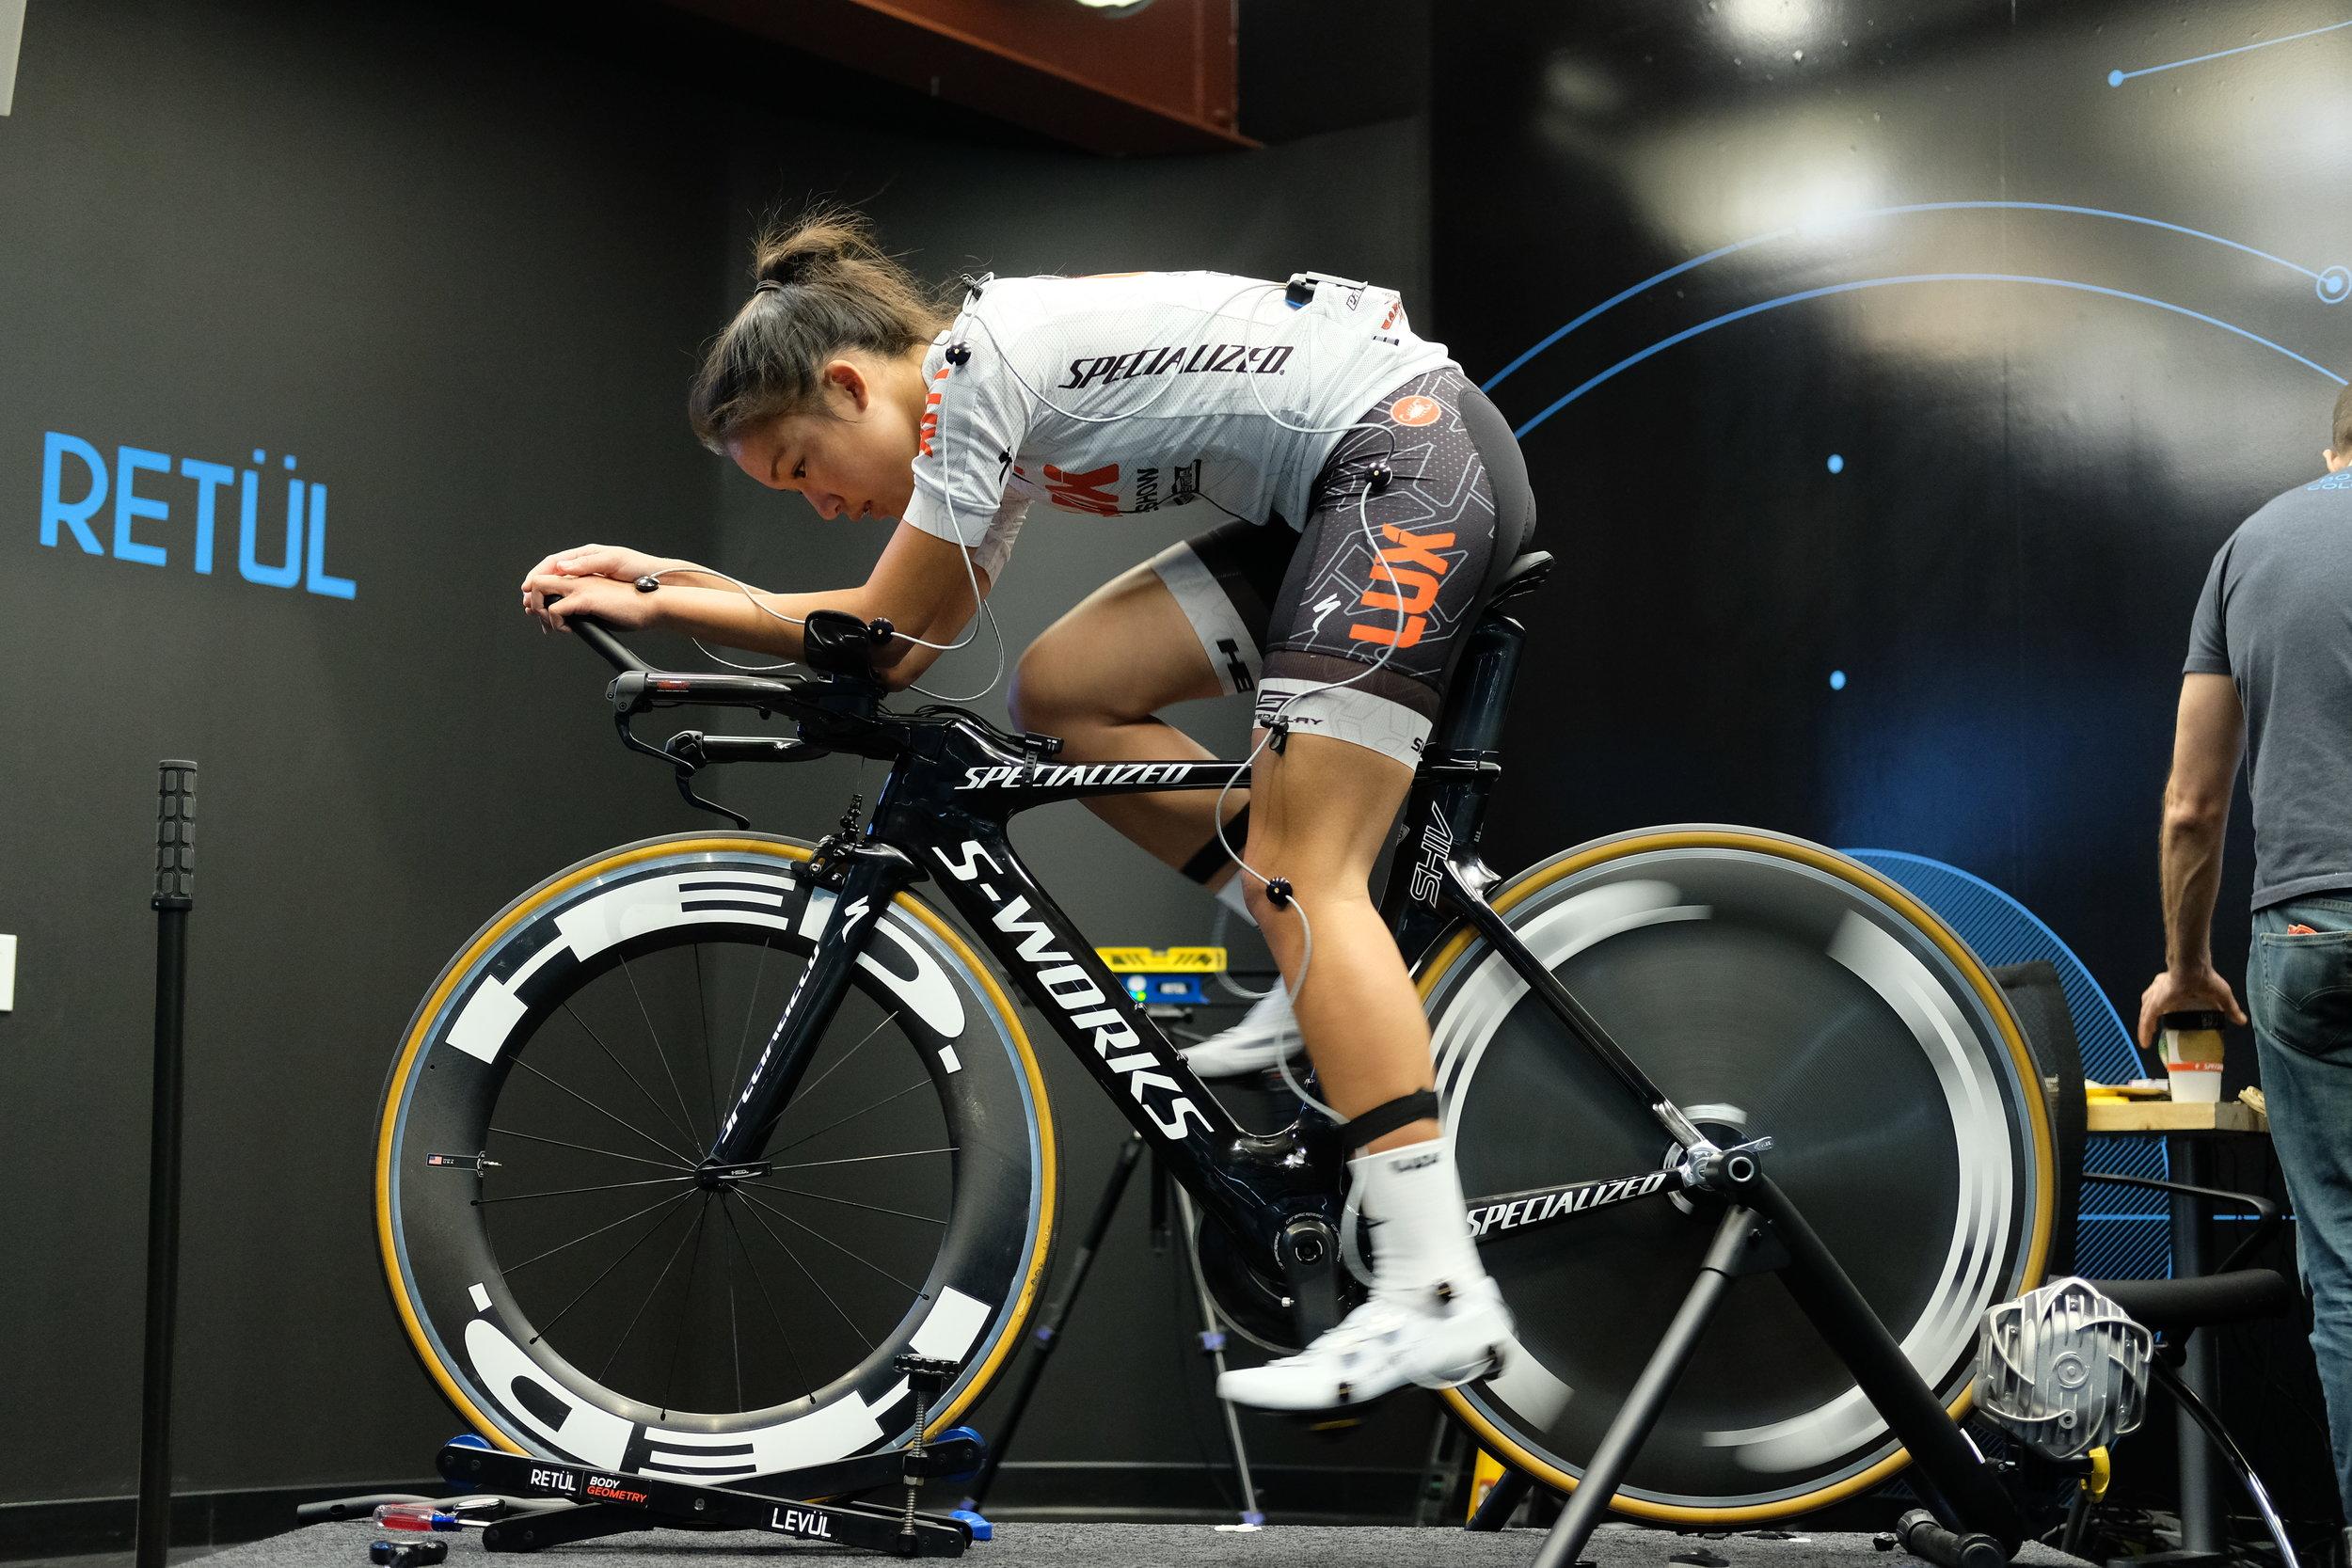 Zoe Ta-Perez, 1st 2018 US National Championship Individual Time Trial Jr 15-16, 2019 National Team European Trip invite- TT Specialist